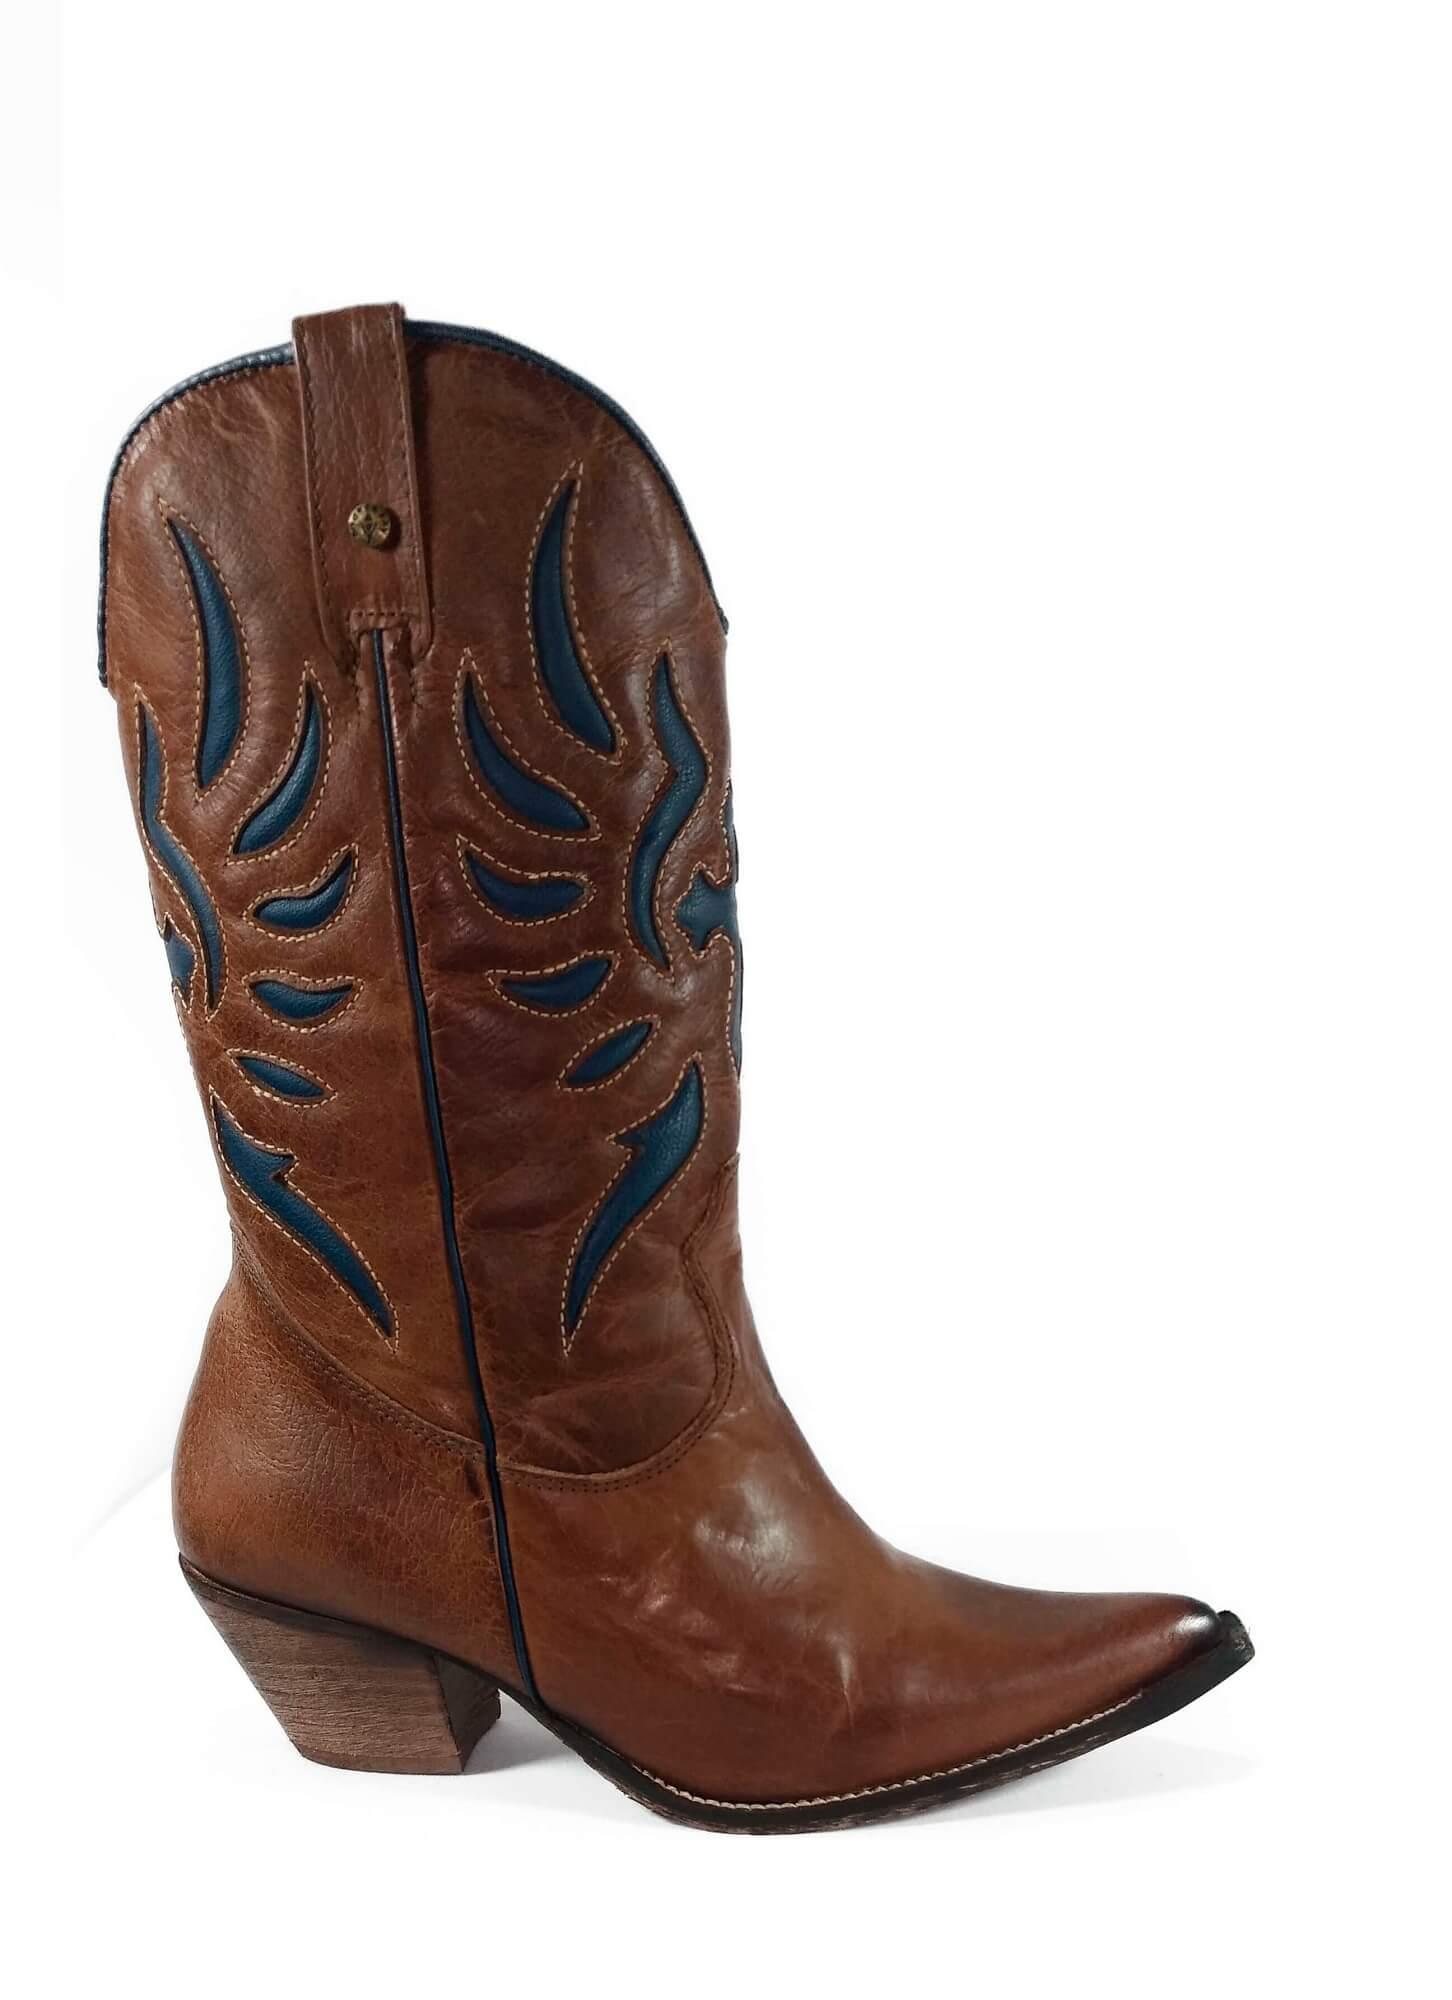 Bota Feminina Andarezzy Texas Soft Saar Ref. 5705